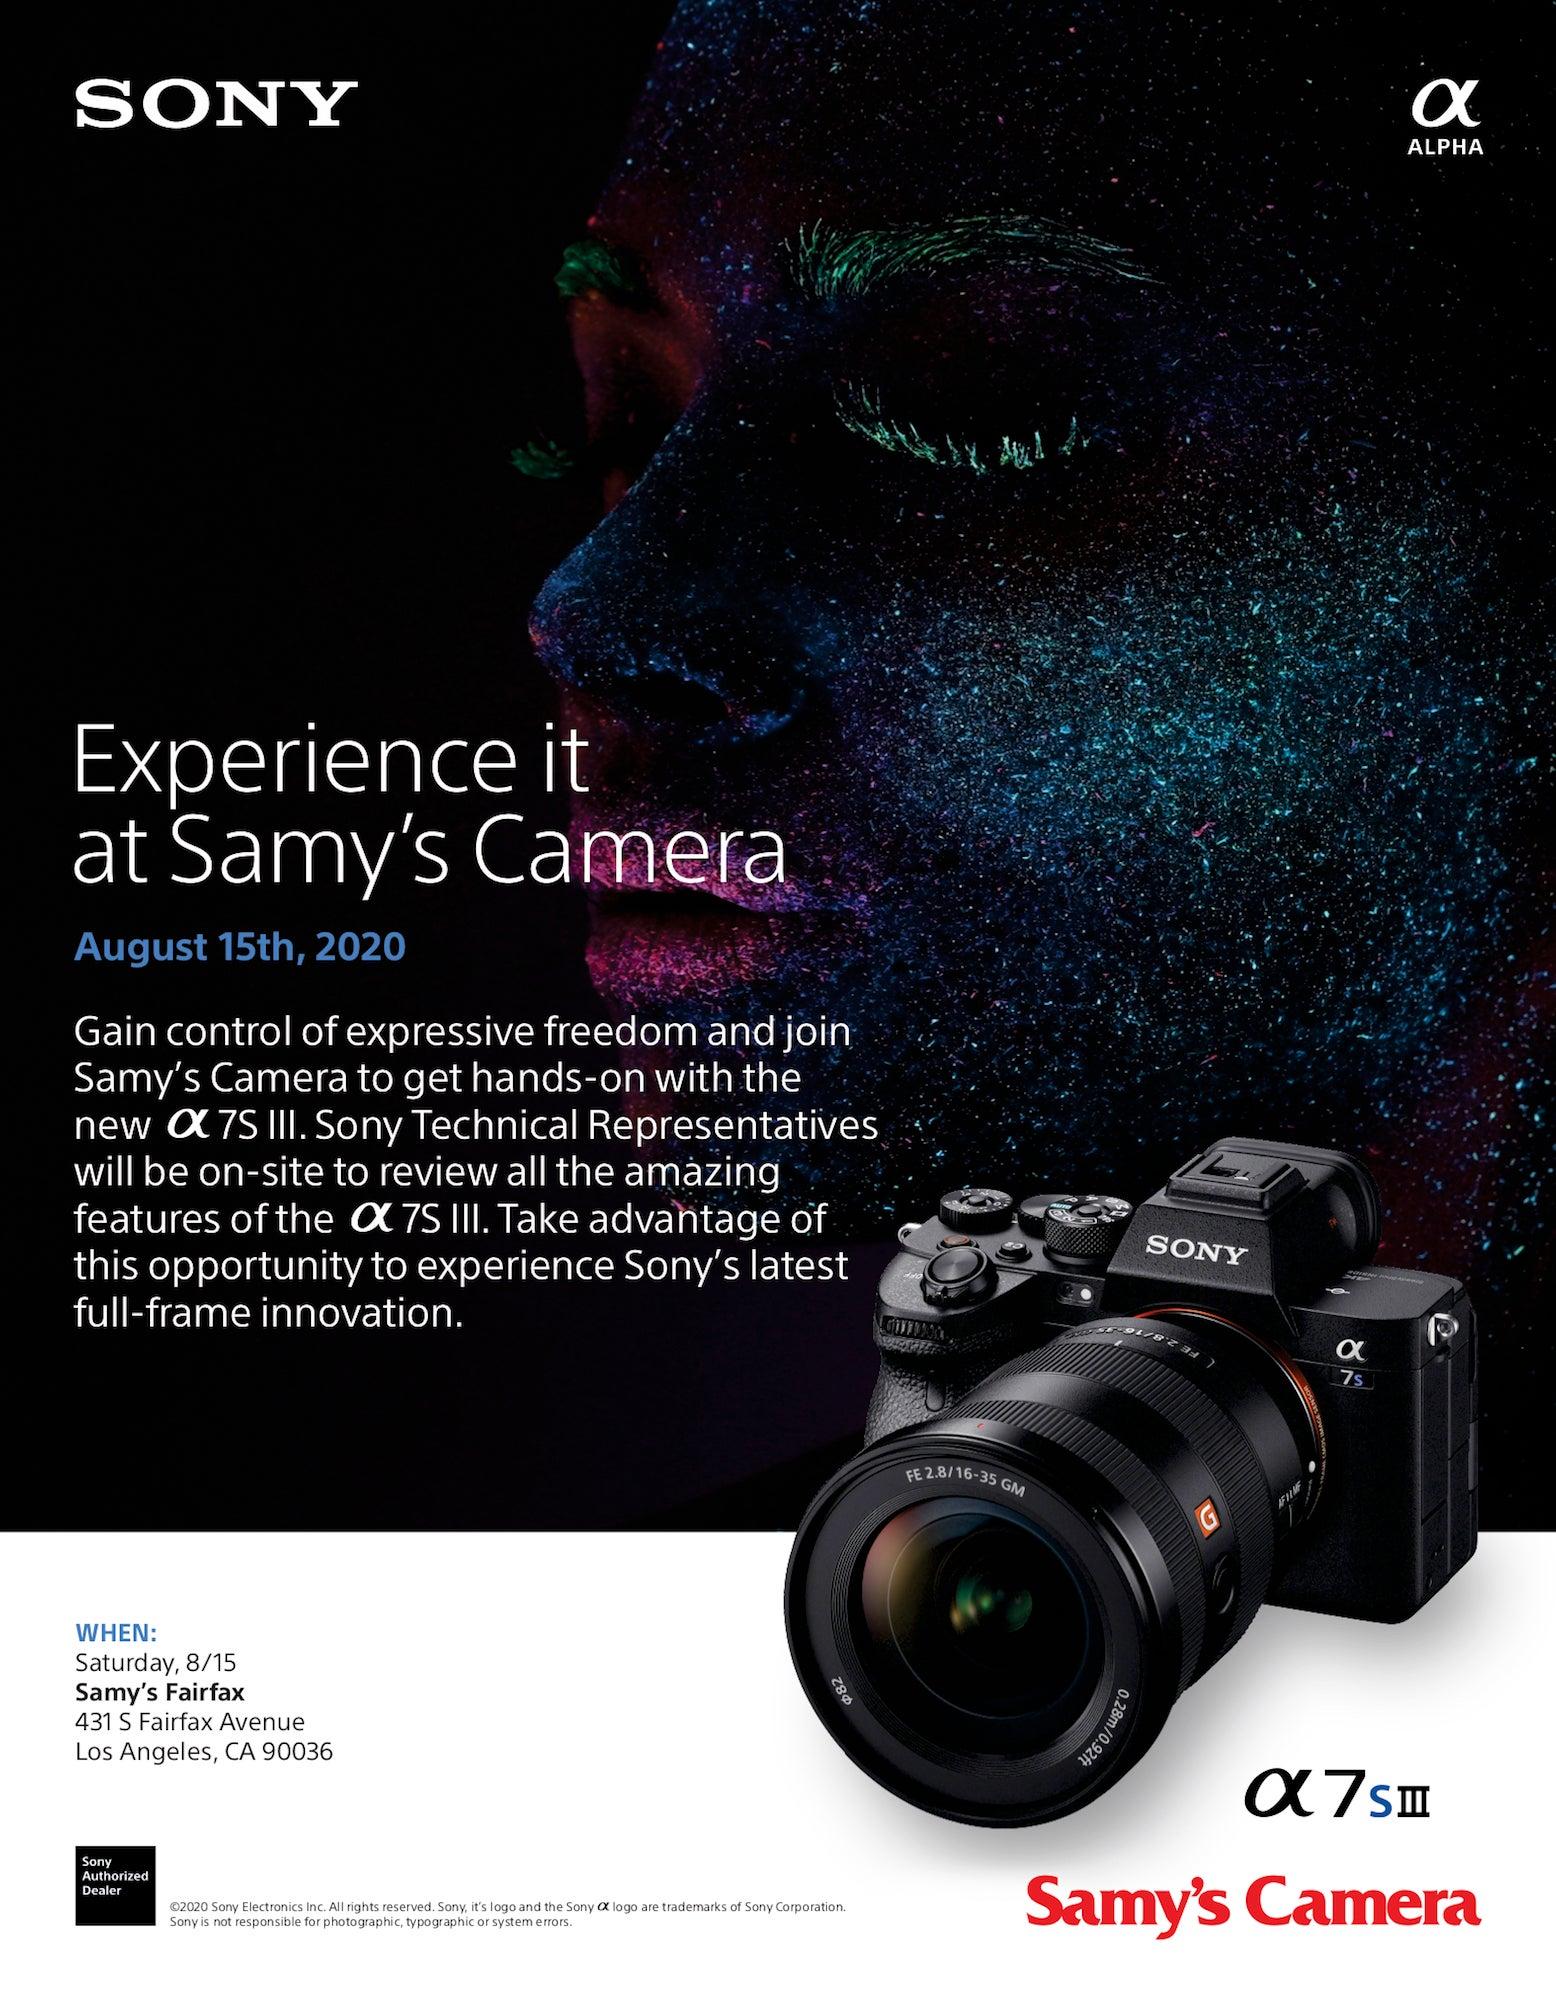 Alpha-Universe-Samys-Camera-A7SIII-Los-Angeles.jpg